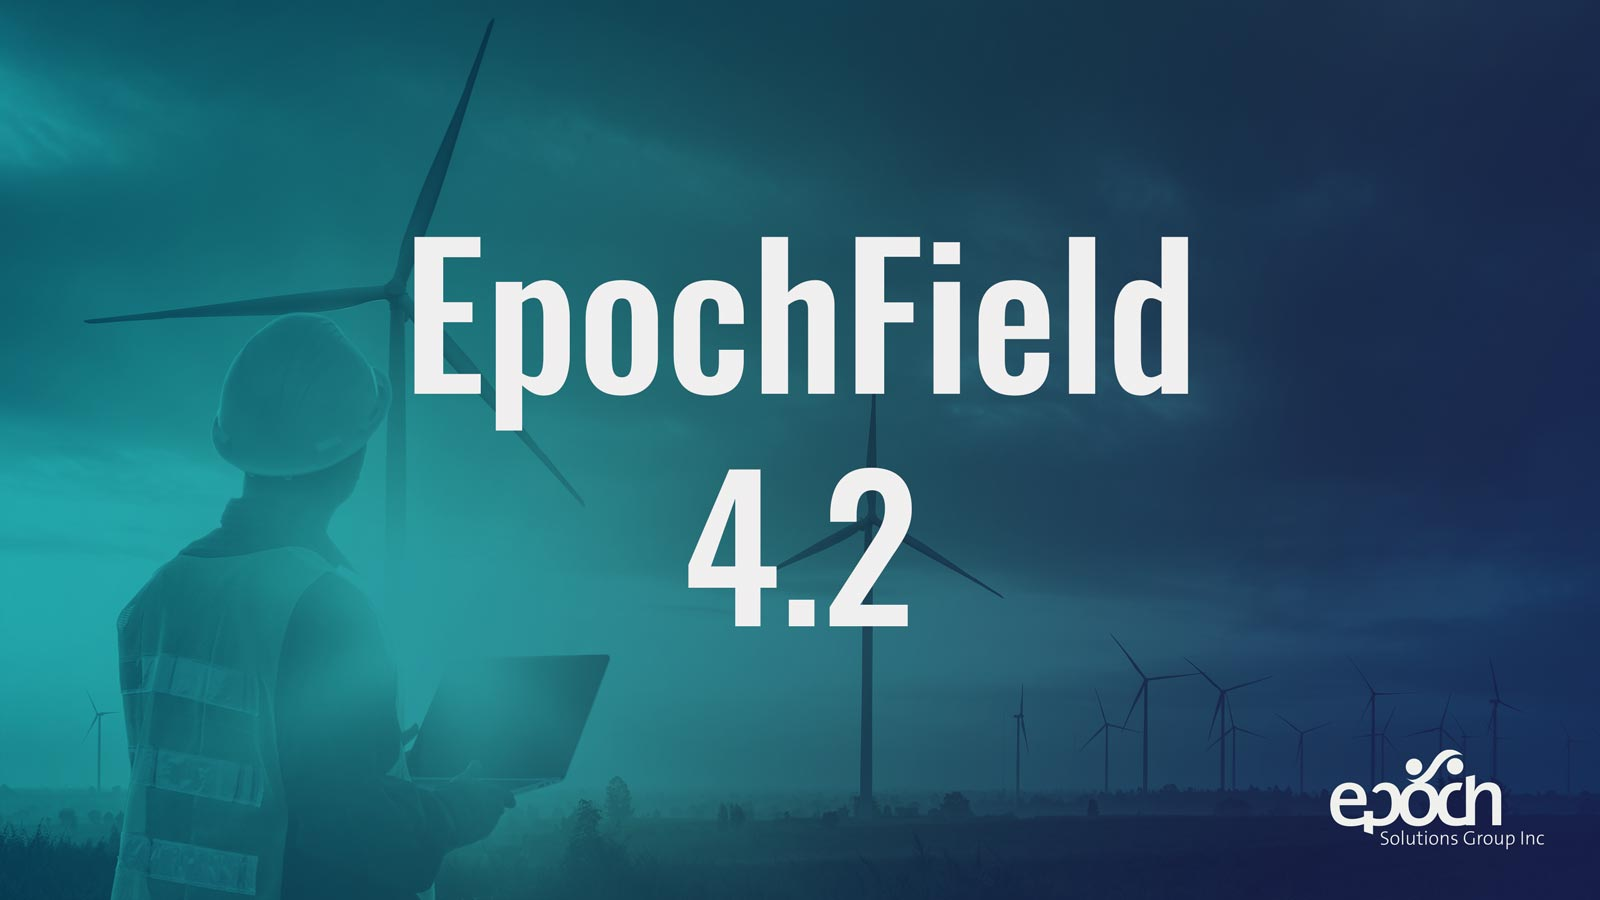 EpochField 4.2 – Just Released!